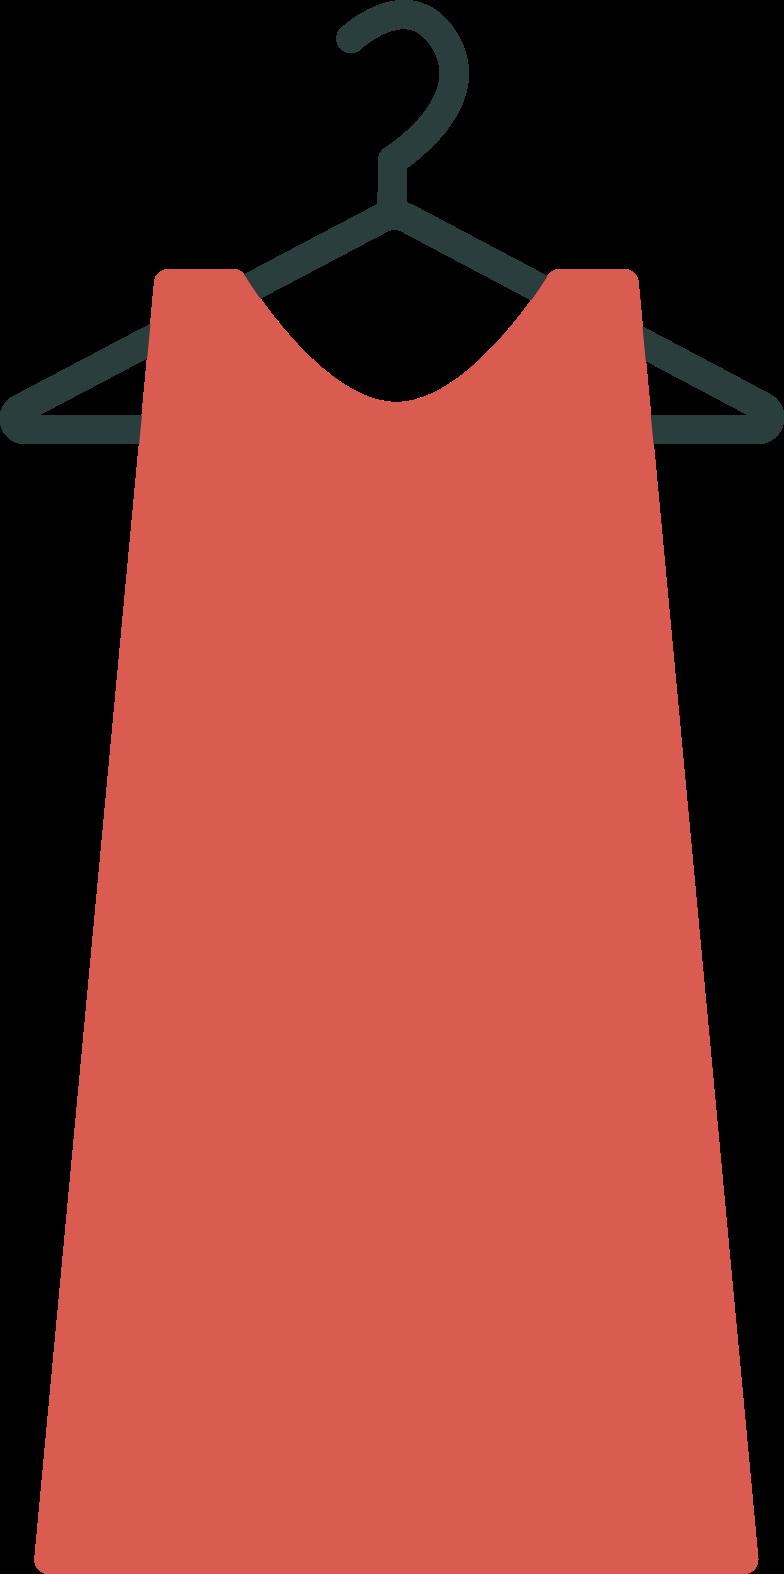 hanger with dress Clipart illustration in PNG, SVG